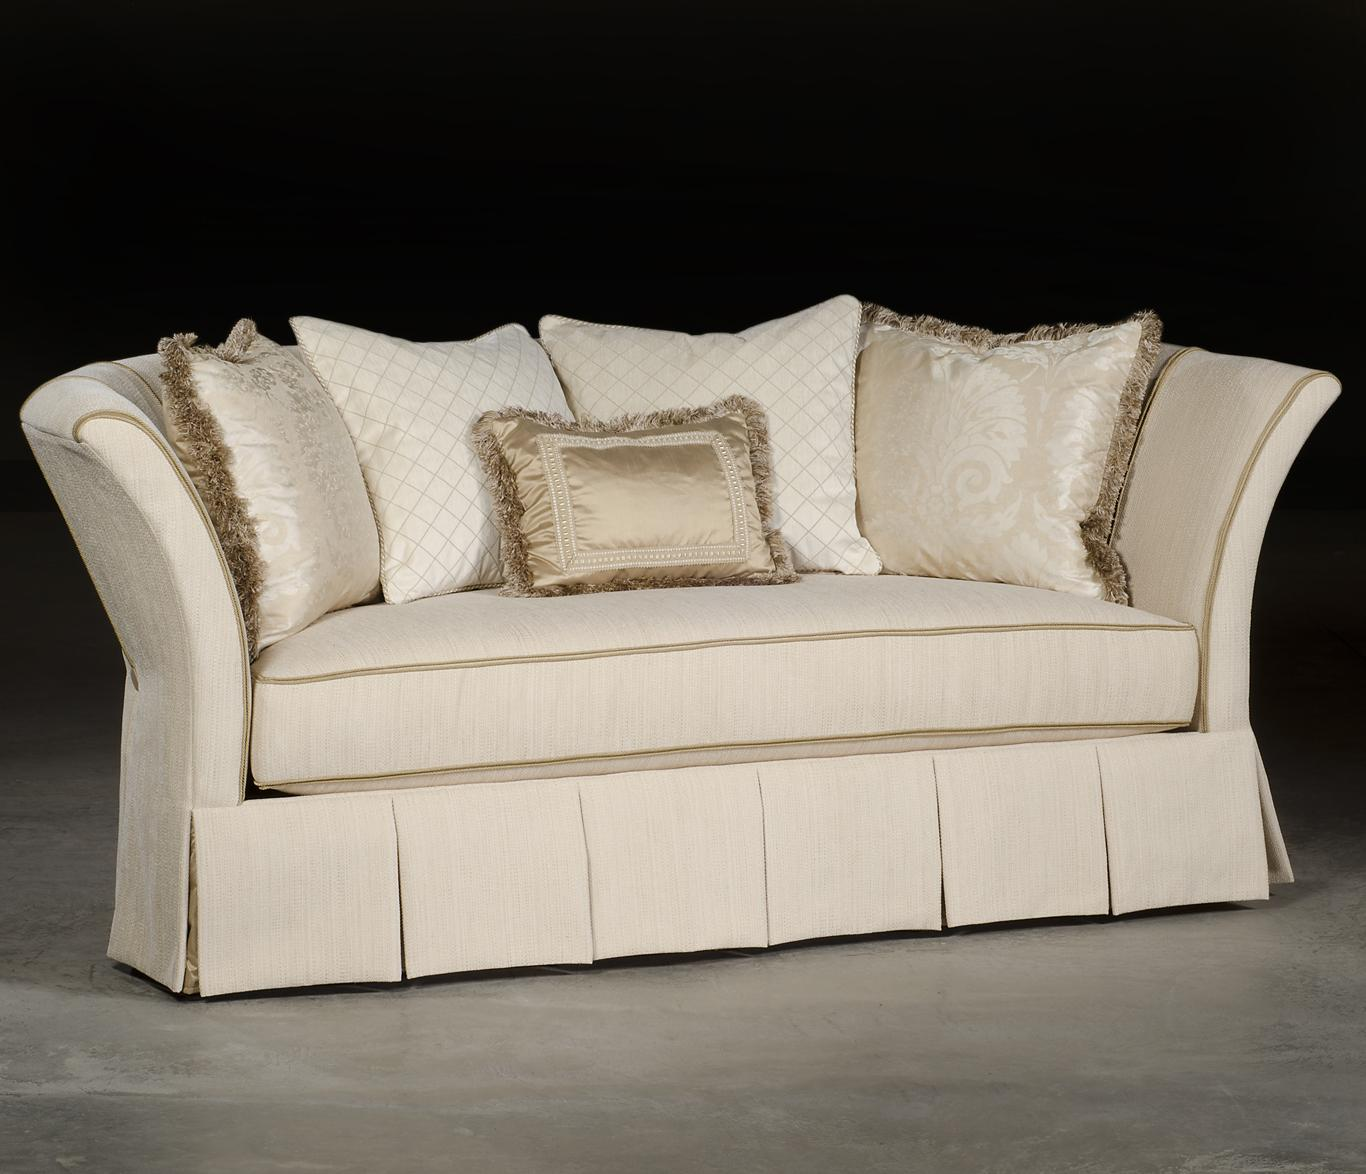 Hayley  Hayley Sofa by Paul Robert at Alison Craig Home Furnishings